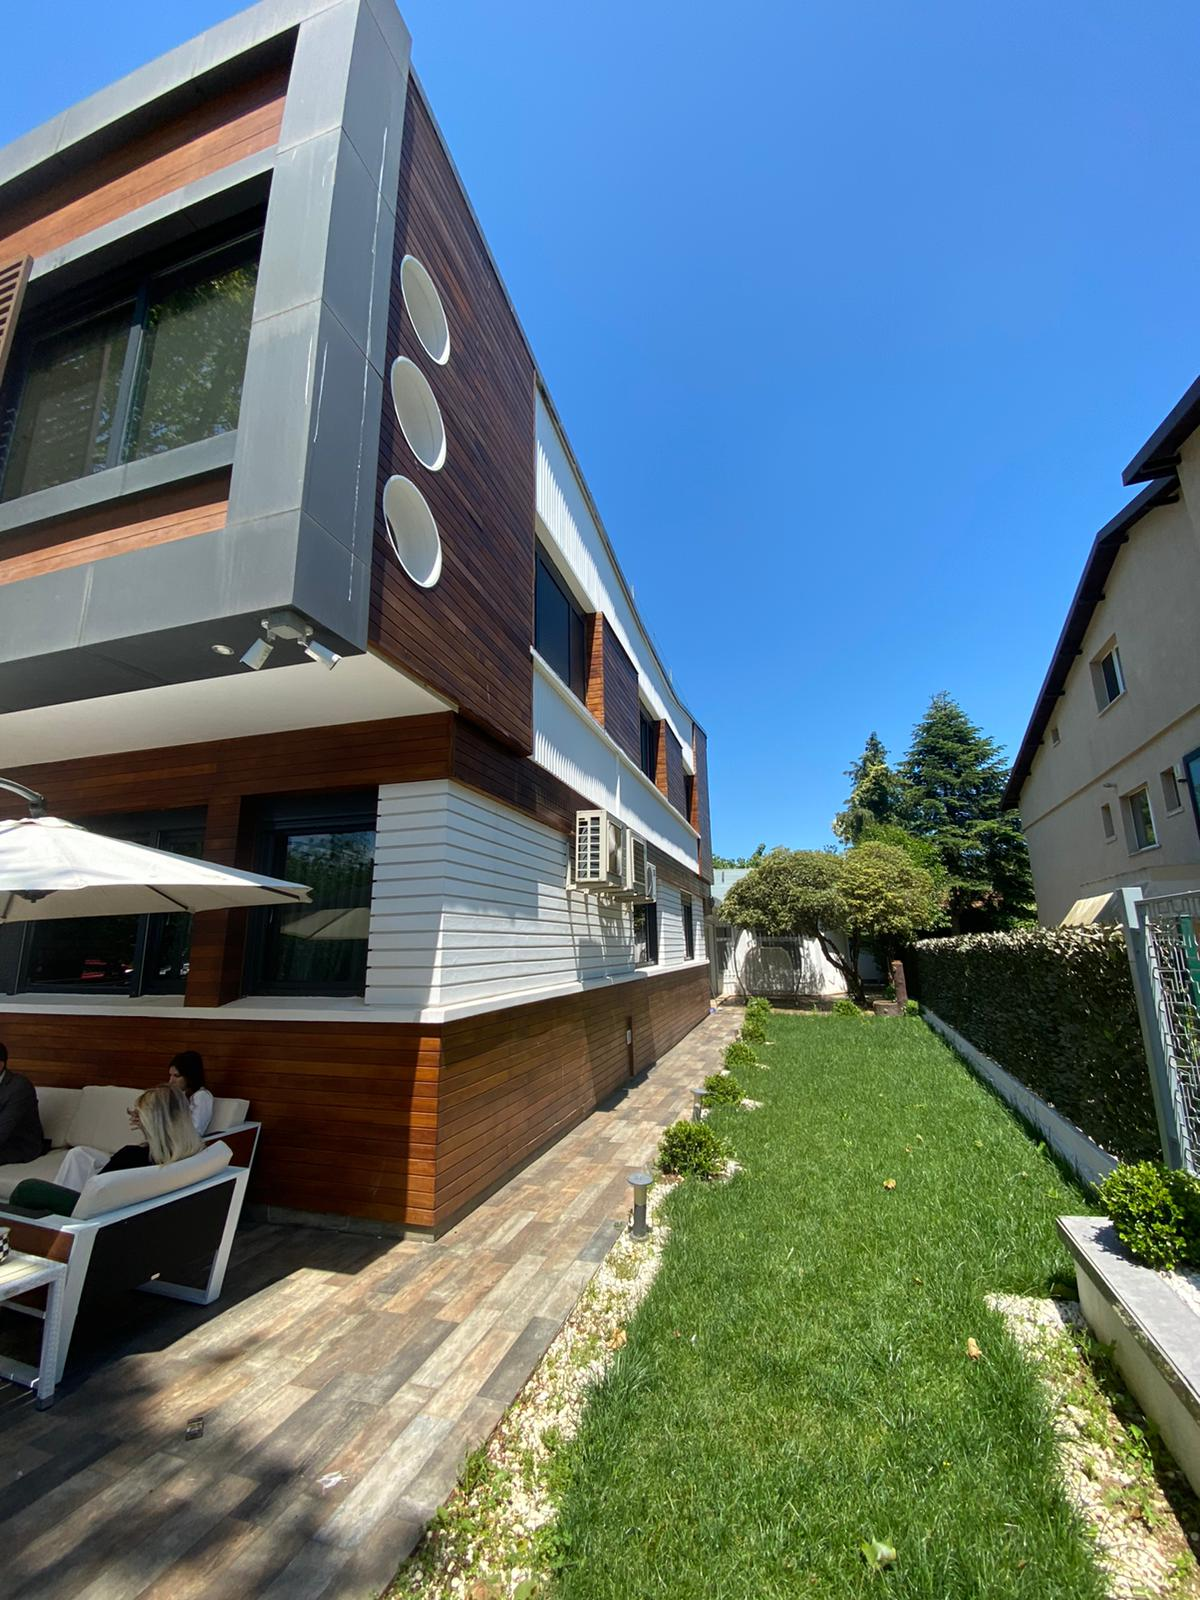 Bosphorus-Istinye-Villa-003.jpg